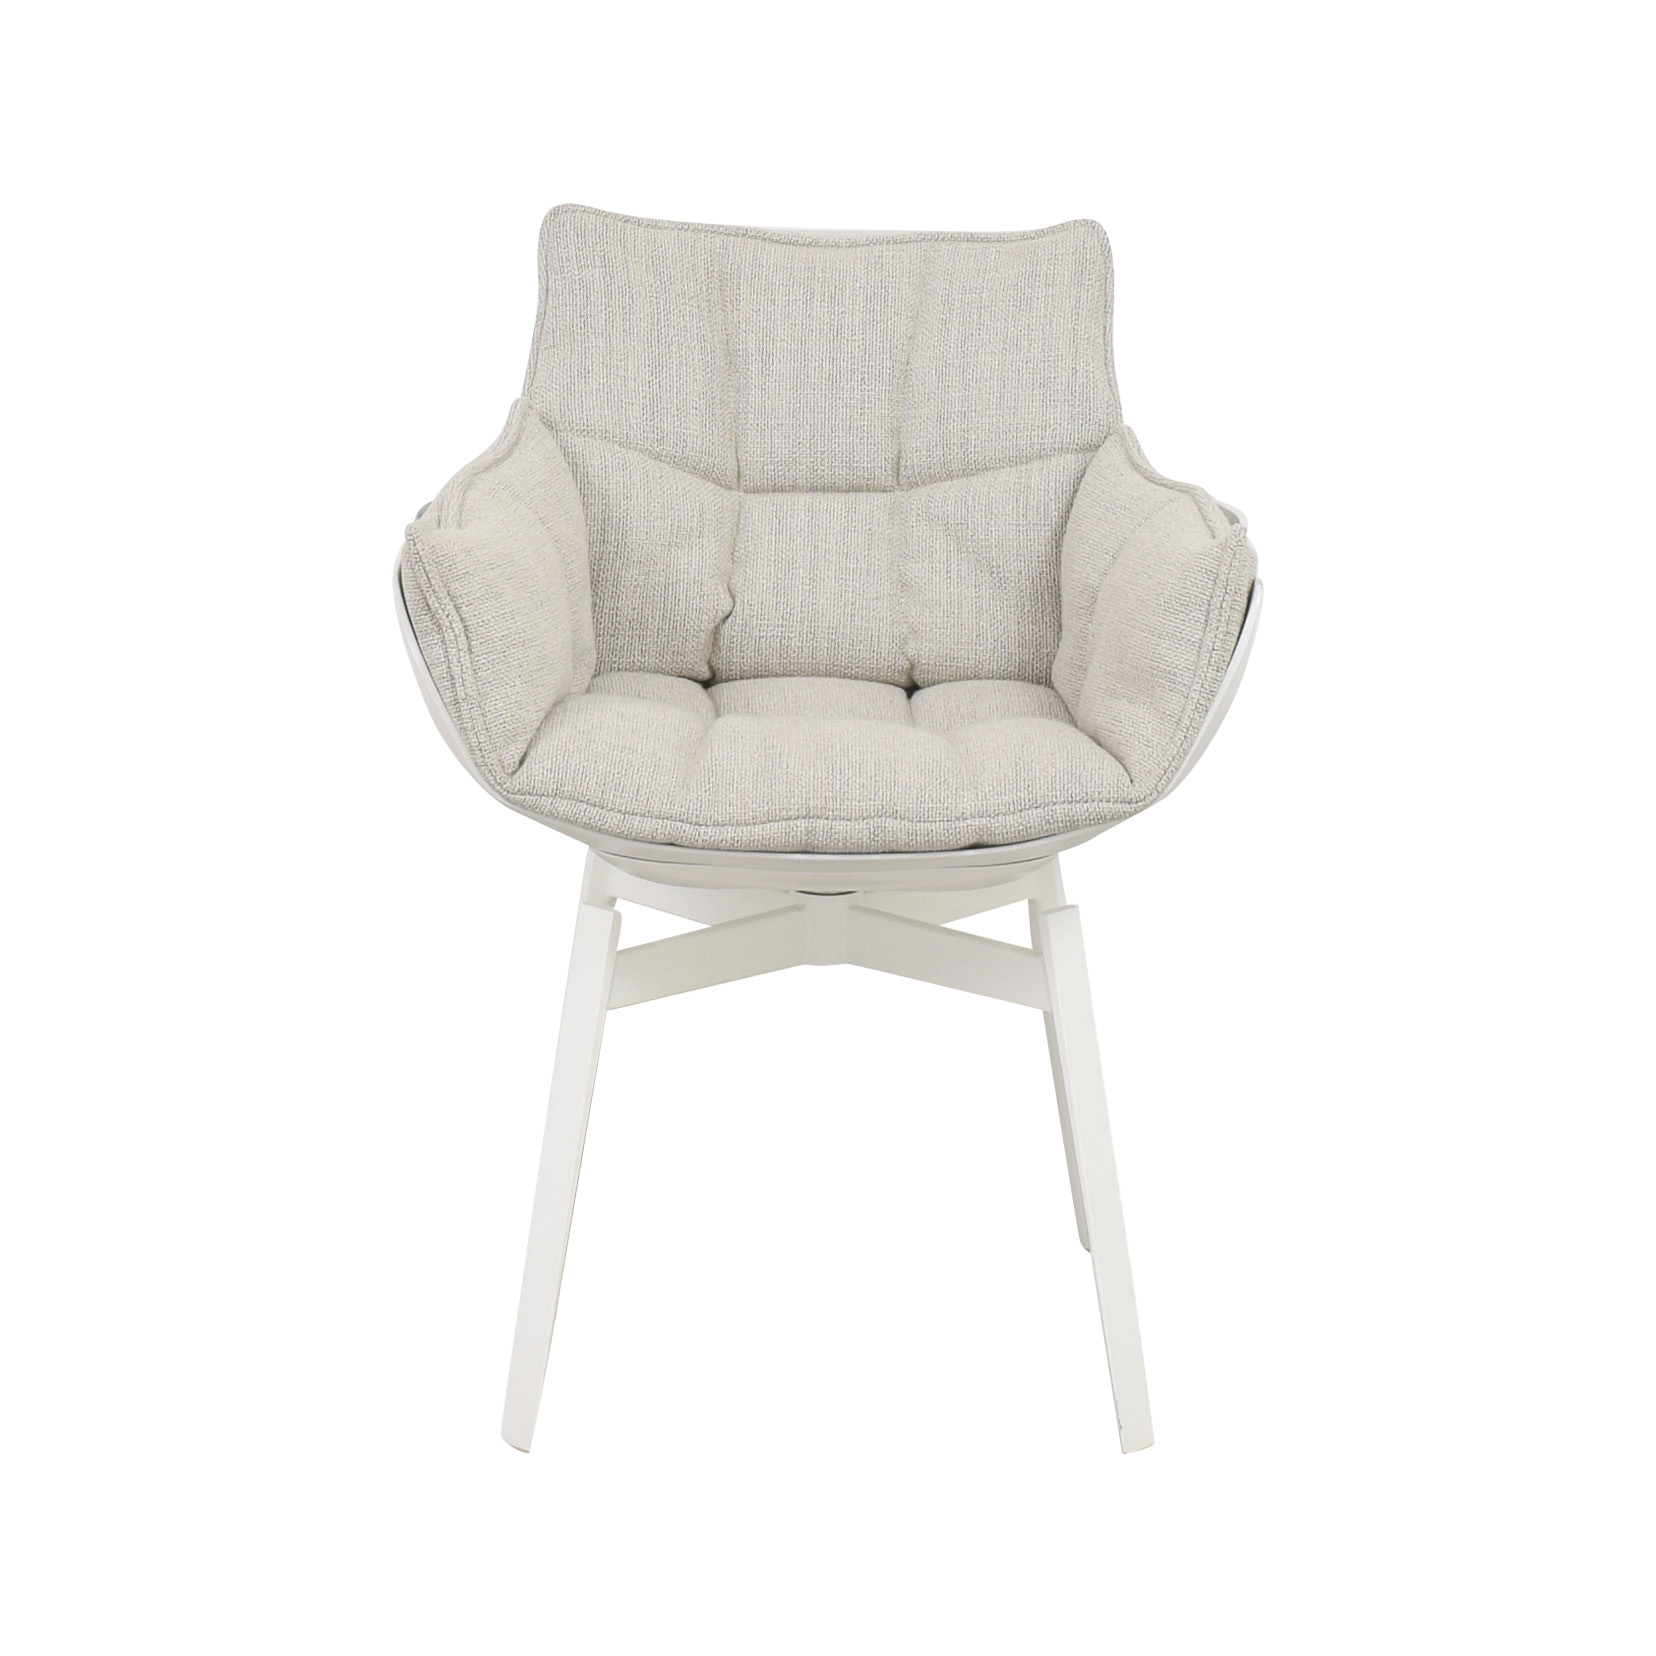 B&B Italia Husk Chair / Accent Chairs